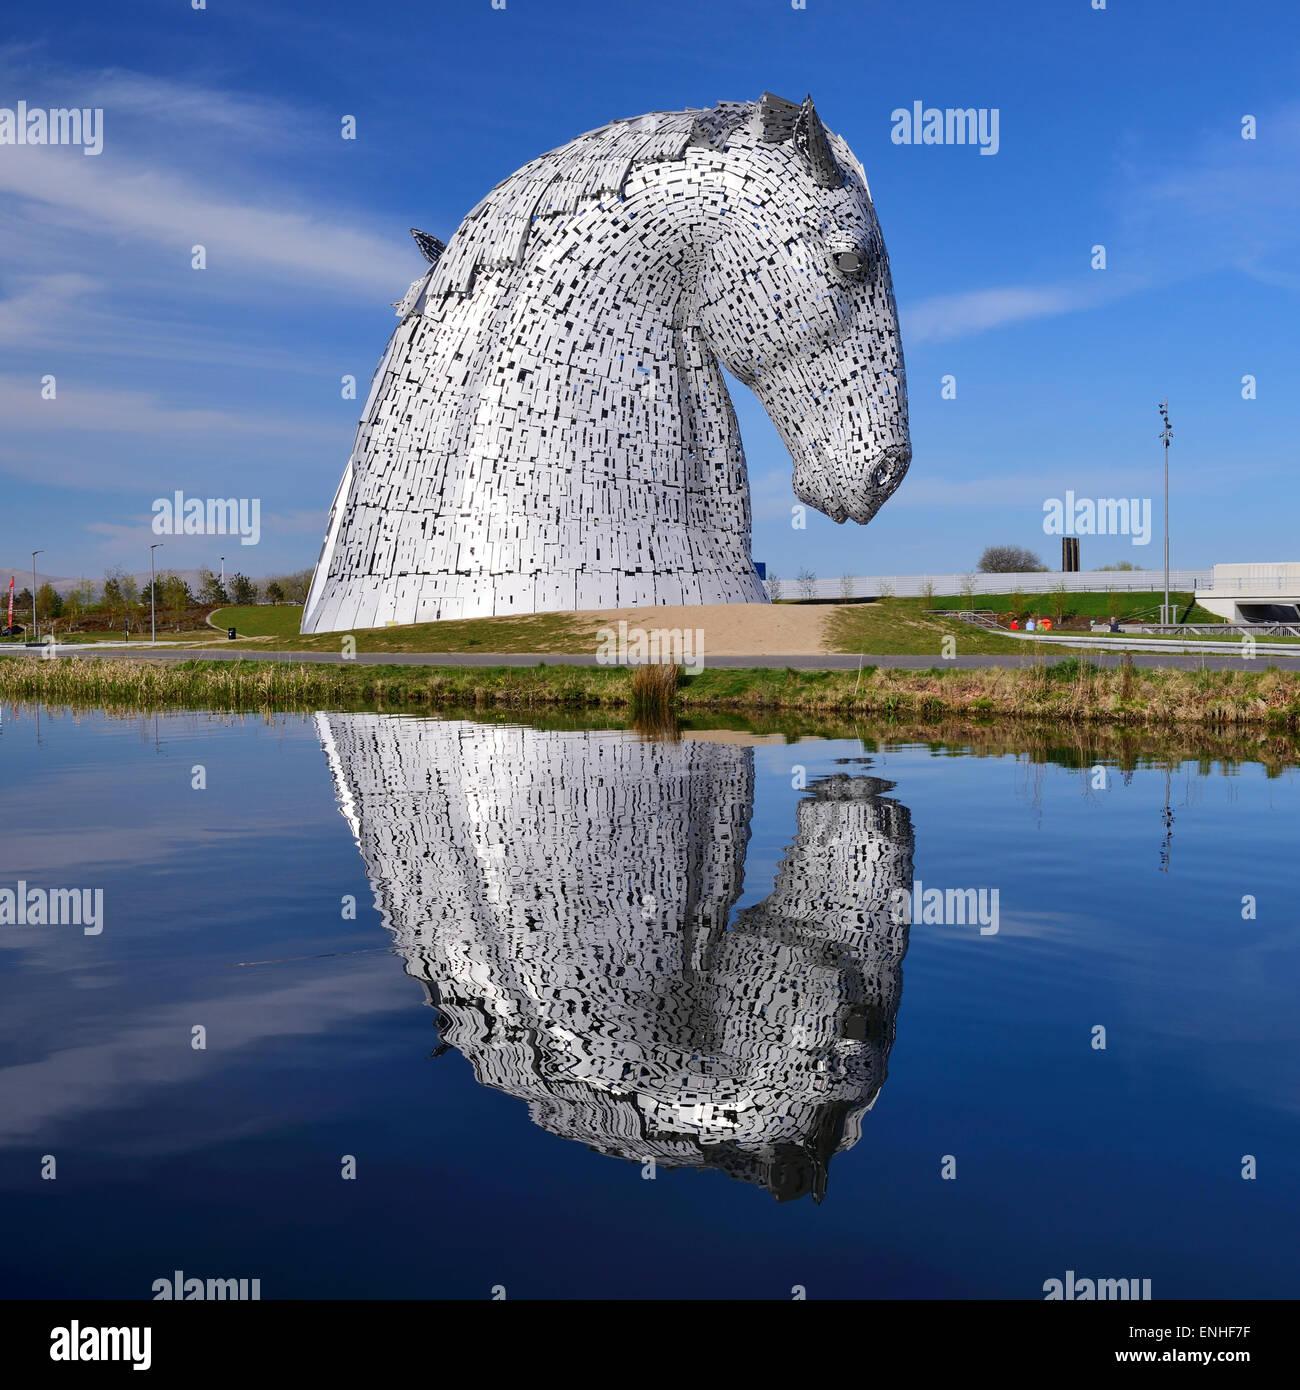 The Kelpies sculptures in Helix Park, Falkirk, Scotland - Stock Image